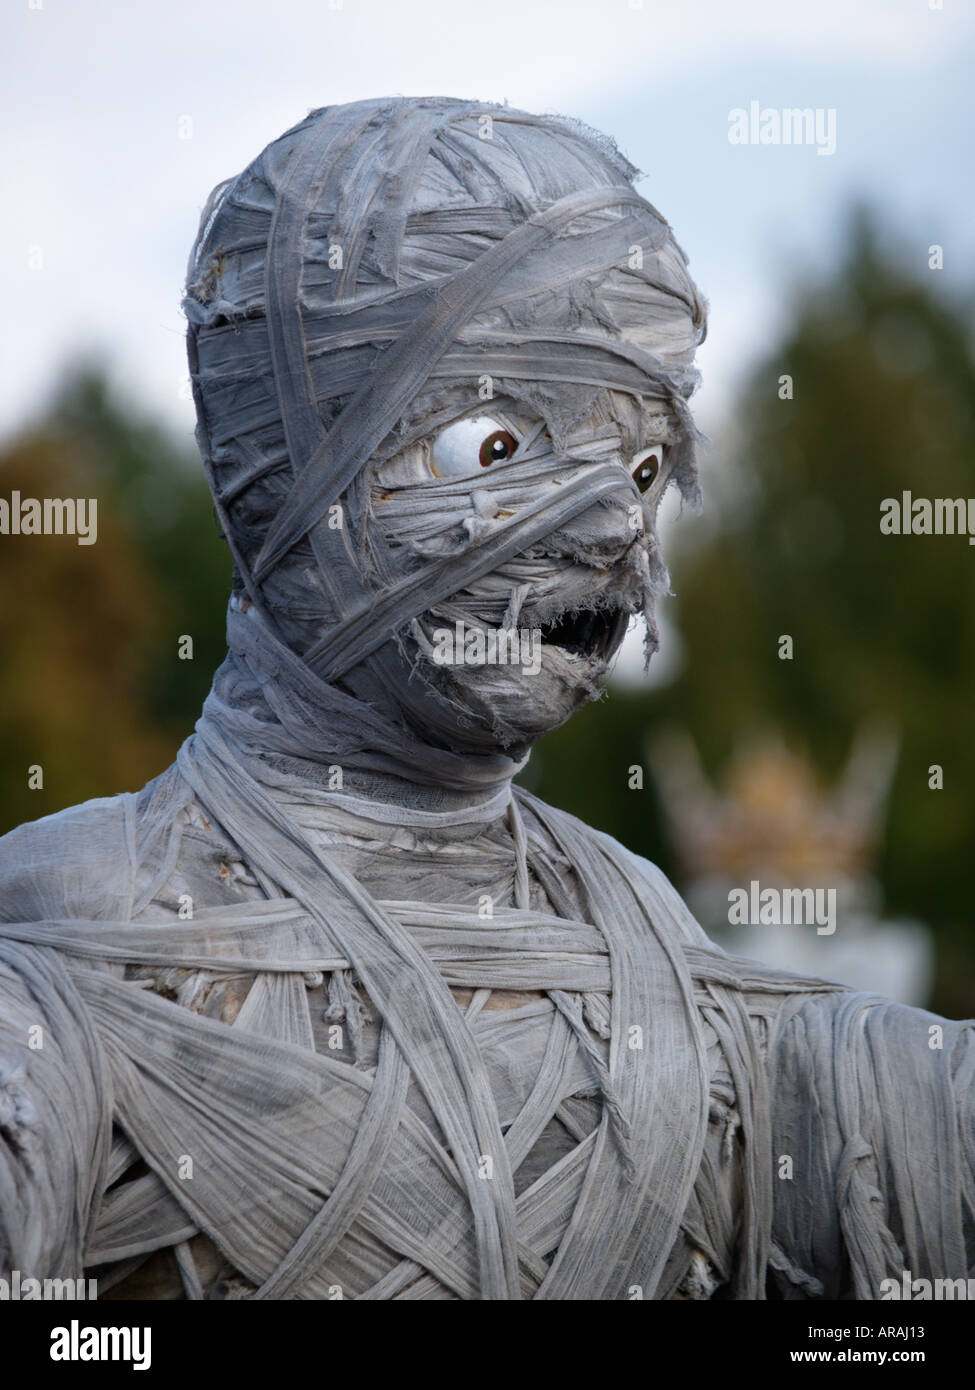 Mummy character in Eurodisney Paris France shot during the halloween season parade - Stock Image